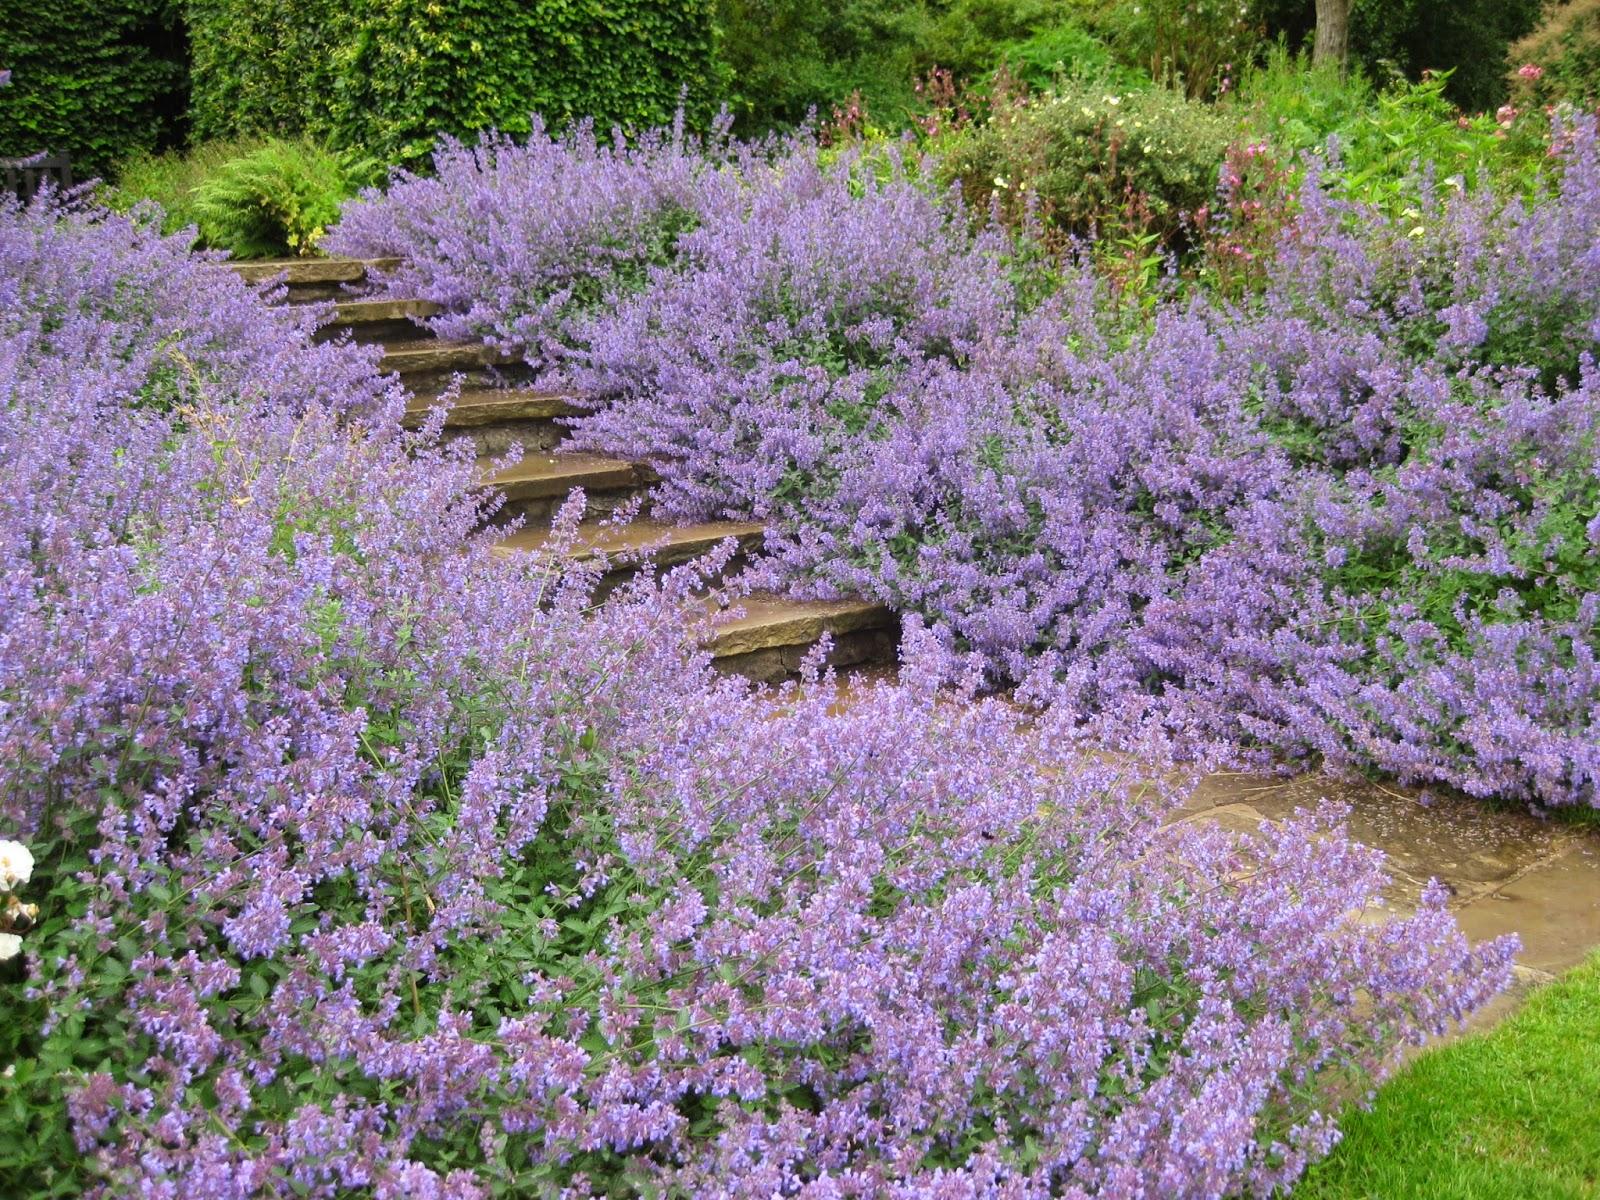 Purple Flowers at Nunnington Hall by Madder Hatter